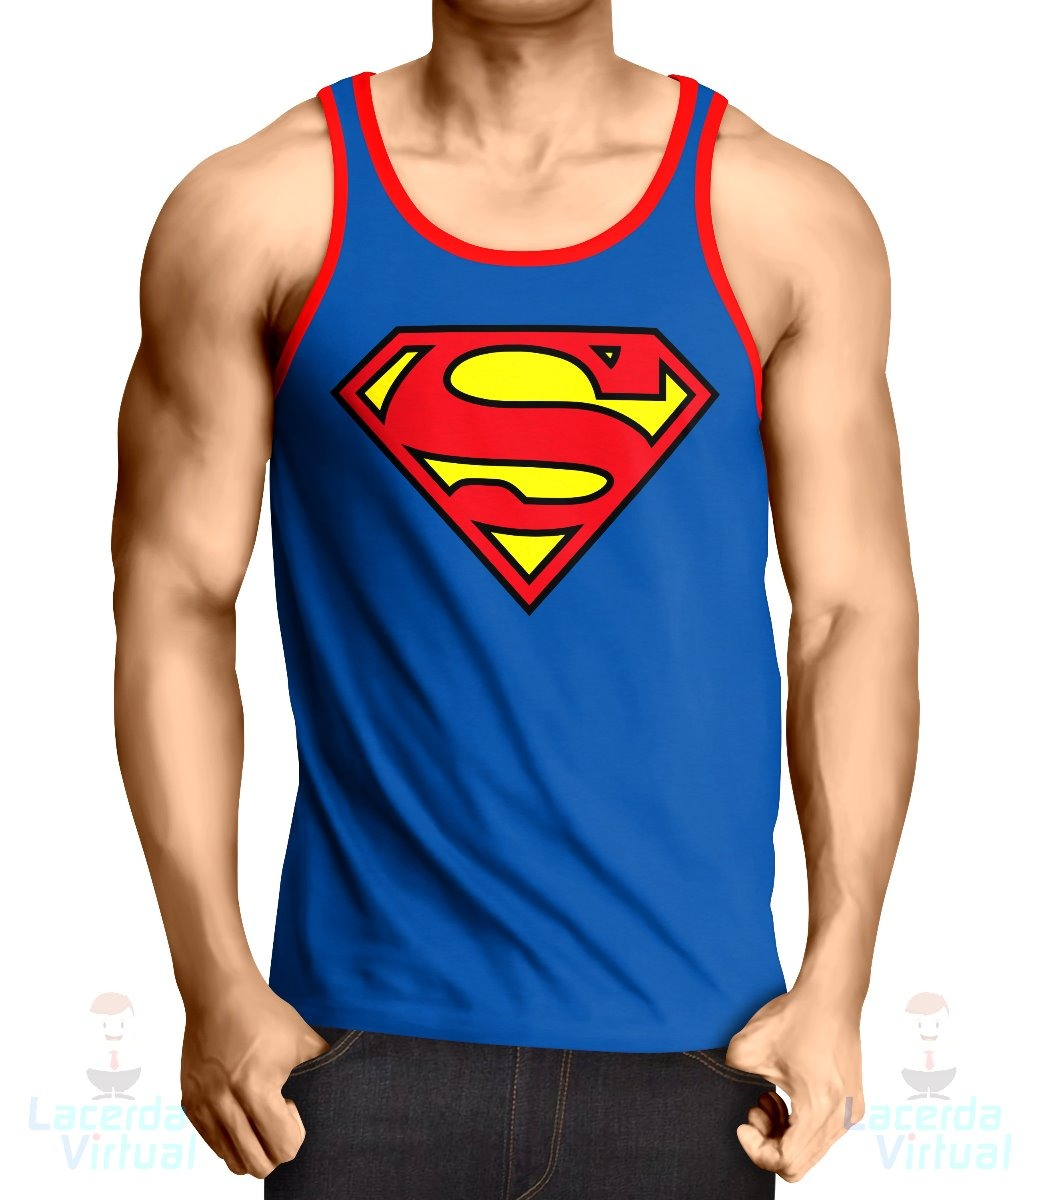 58f22f6cf ... camiseta regata superman logo. Carregando zoom.